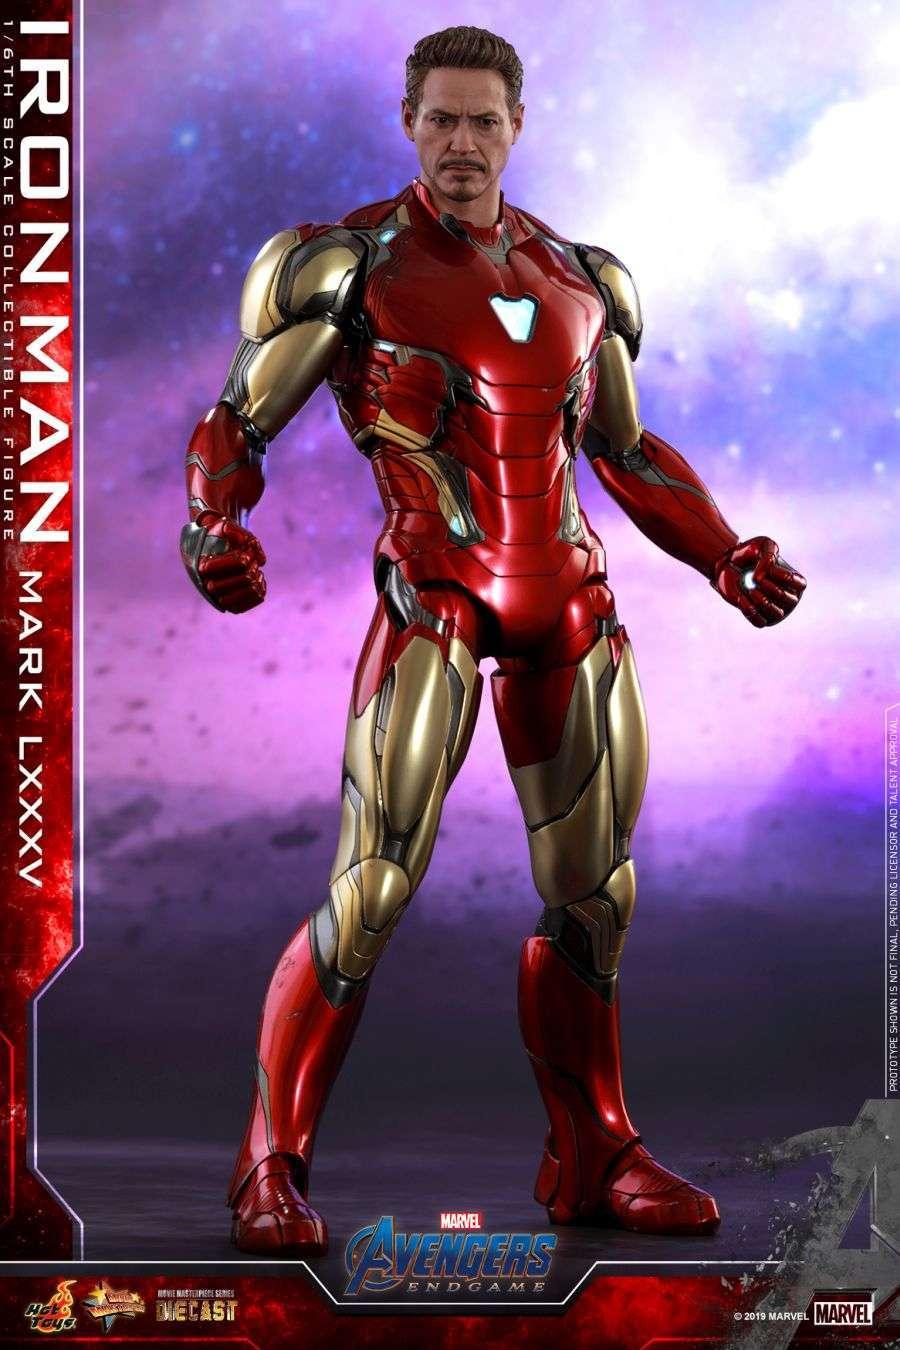 Hot Toys - Avengers 4 - Iron Man Mark LXXXV collectible figure_PR1